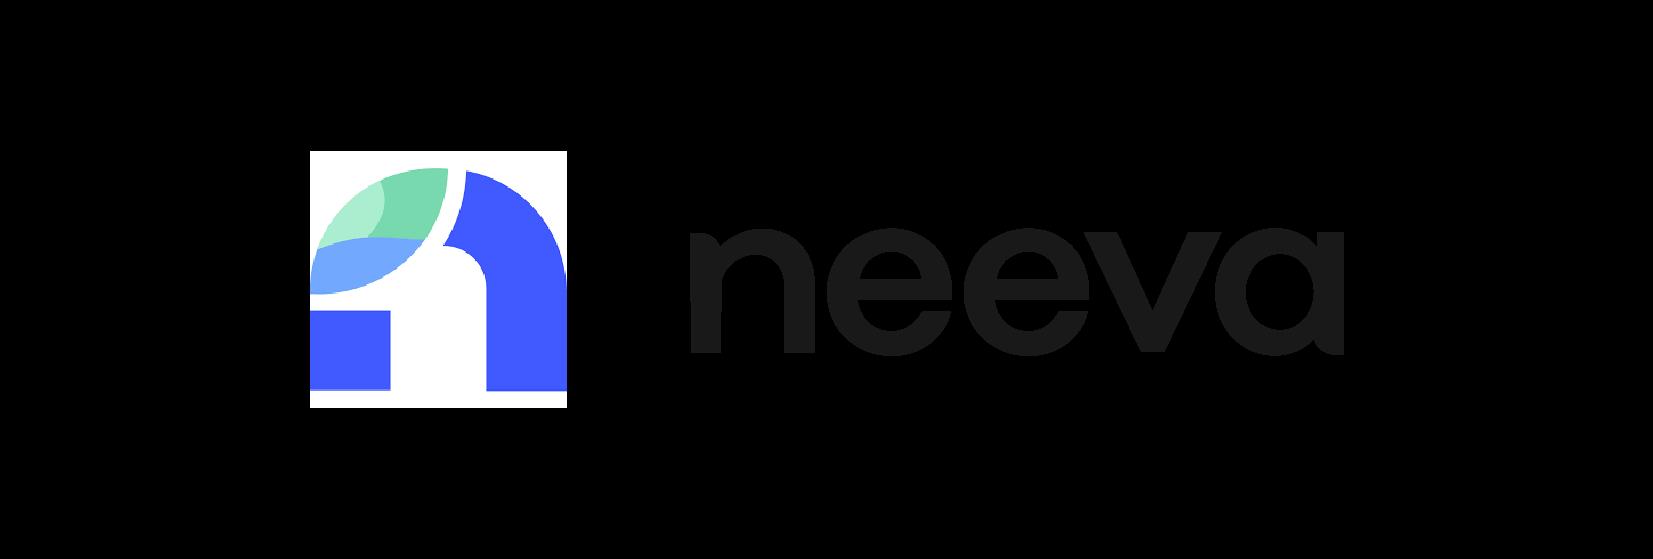 NEEVA-01-01